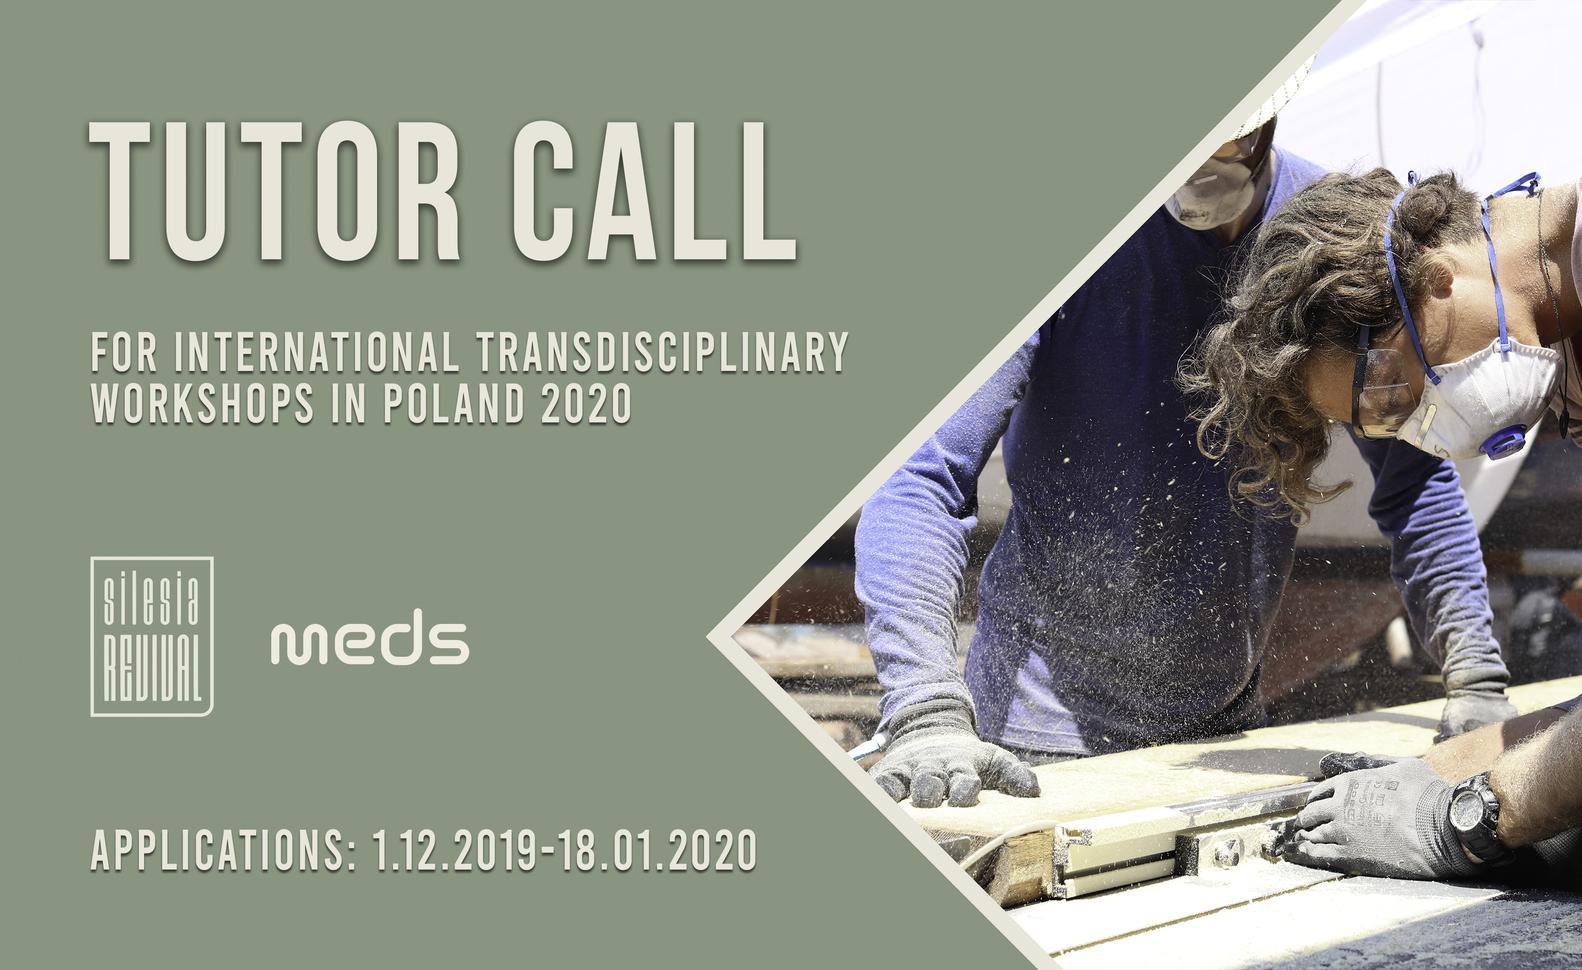 open-uri20191127-22868-1x8y2tg